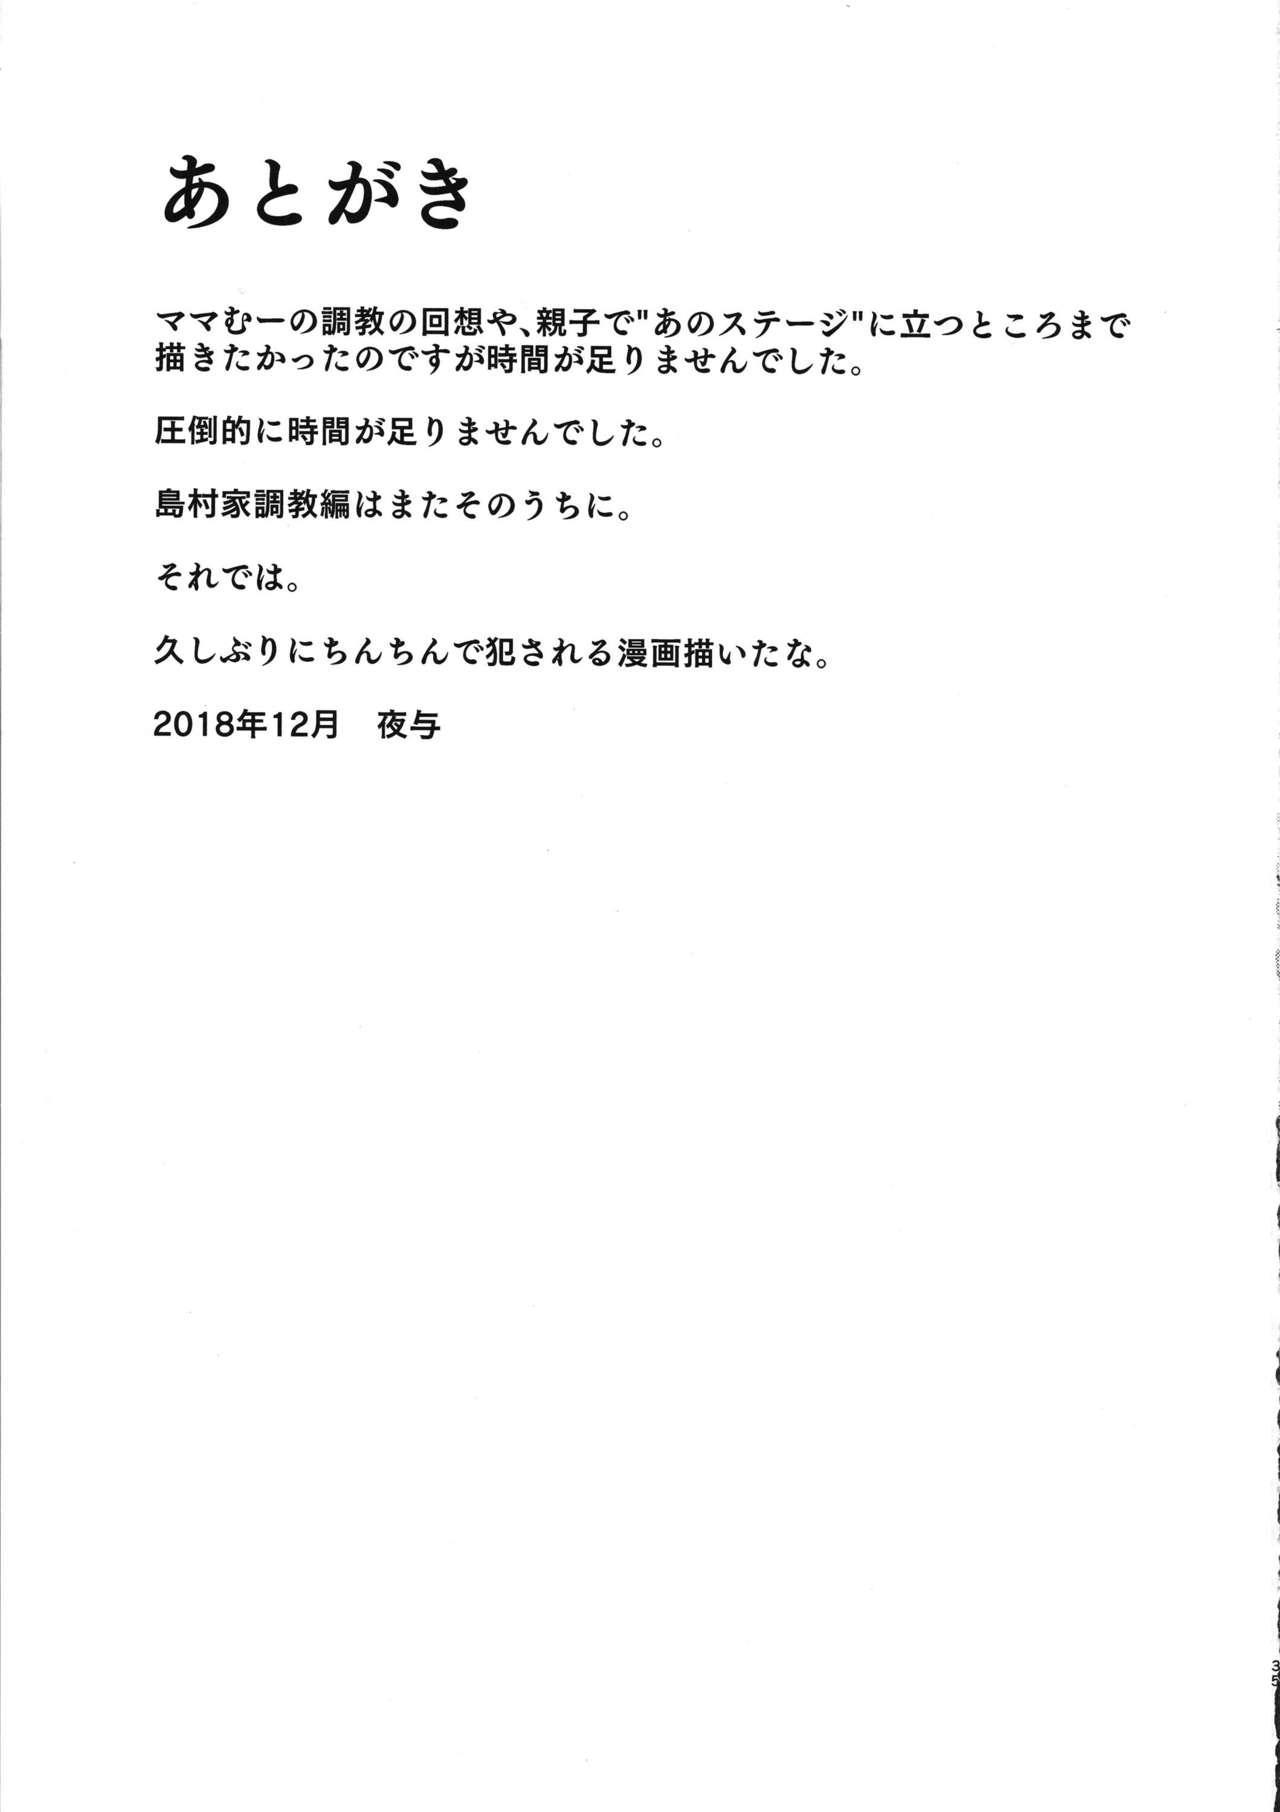 (C97) [MillionLove (Yayo)] Perfect Lesson 0 - Shimamura-ke Kanraku Hen (THE IDOLM@STER CINDERELLA GIRLS) [Chinese] [黄记汉化组] 34